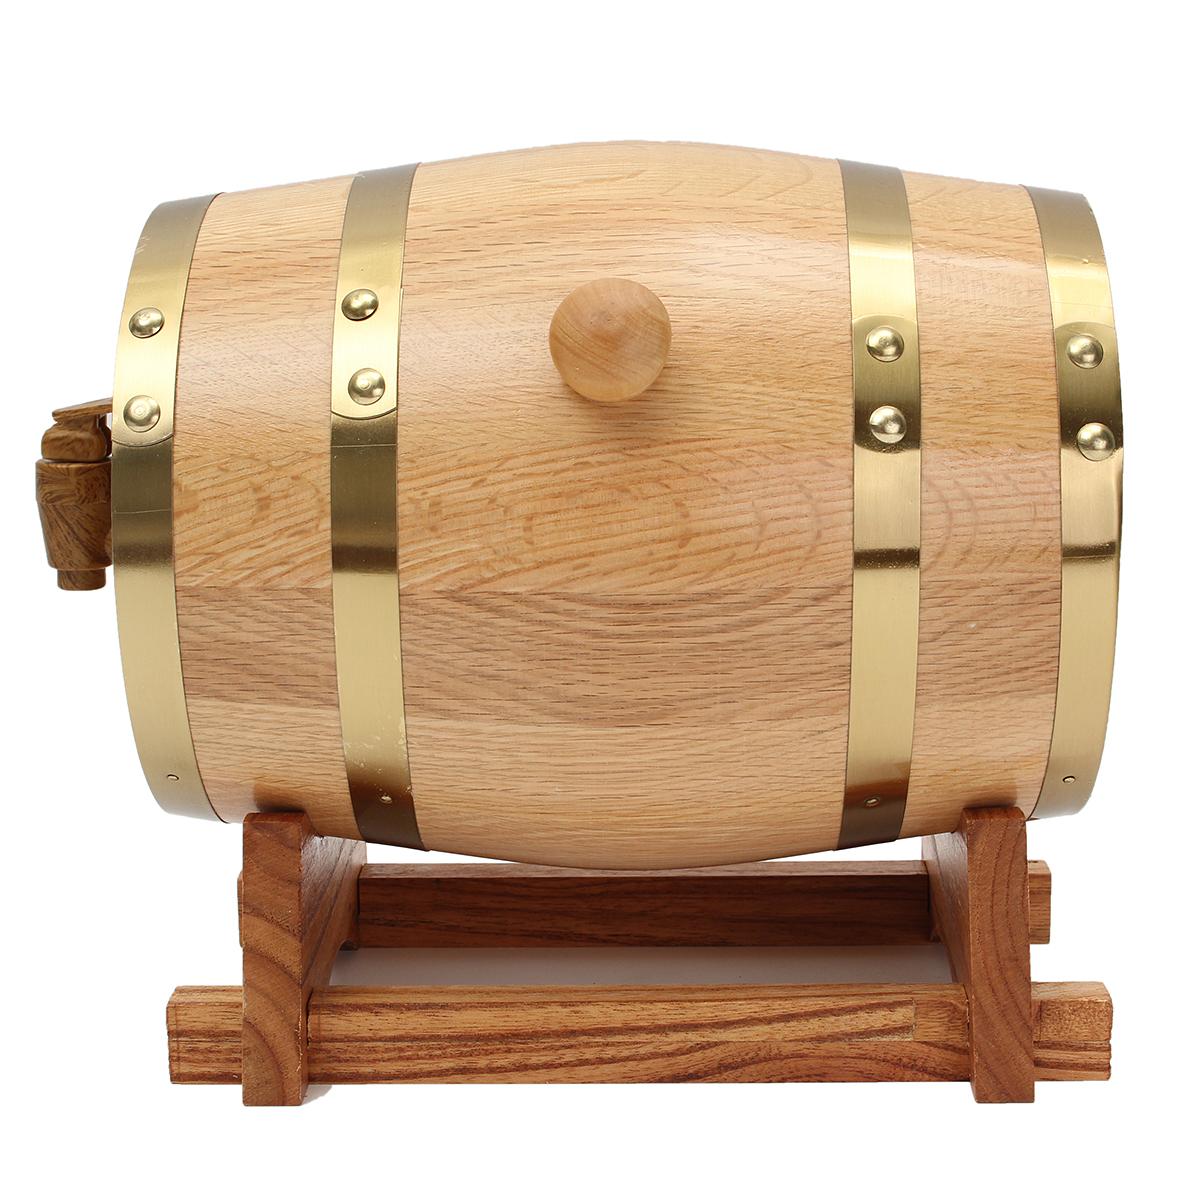 3L Wooden Barrel with Spigot for Whisky Wine Liquor Homebrew